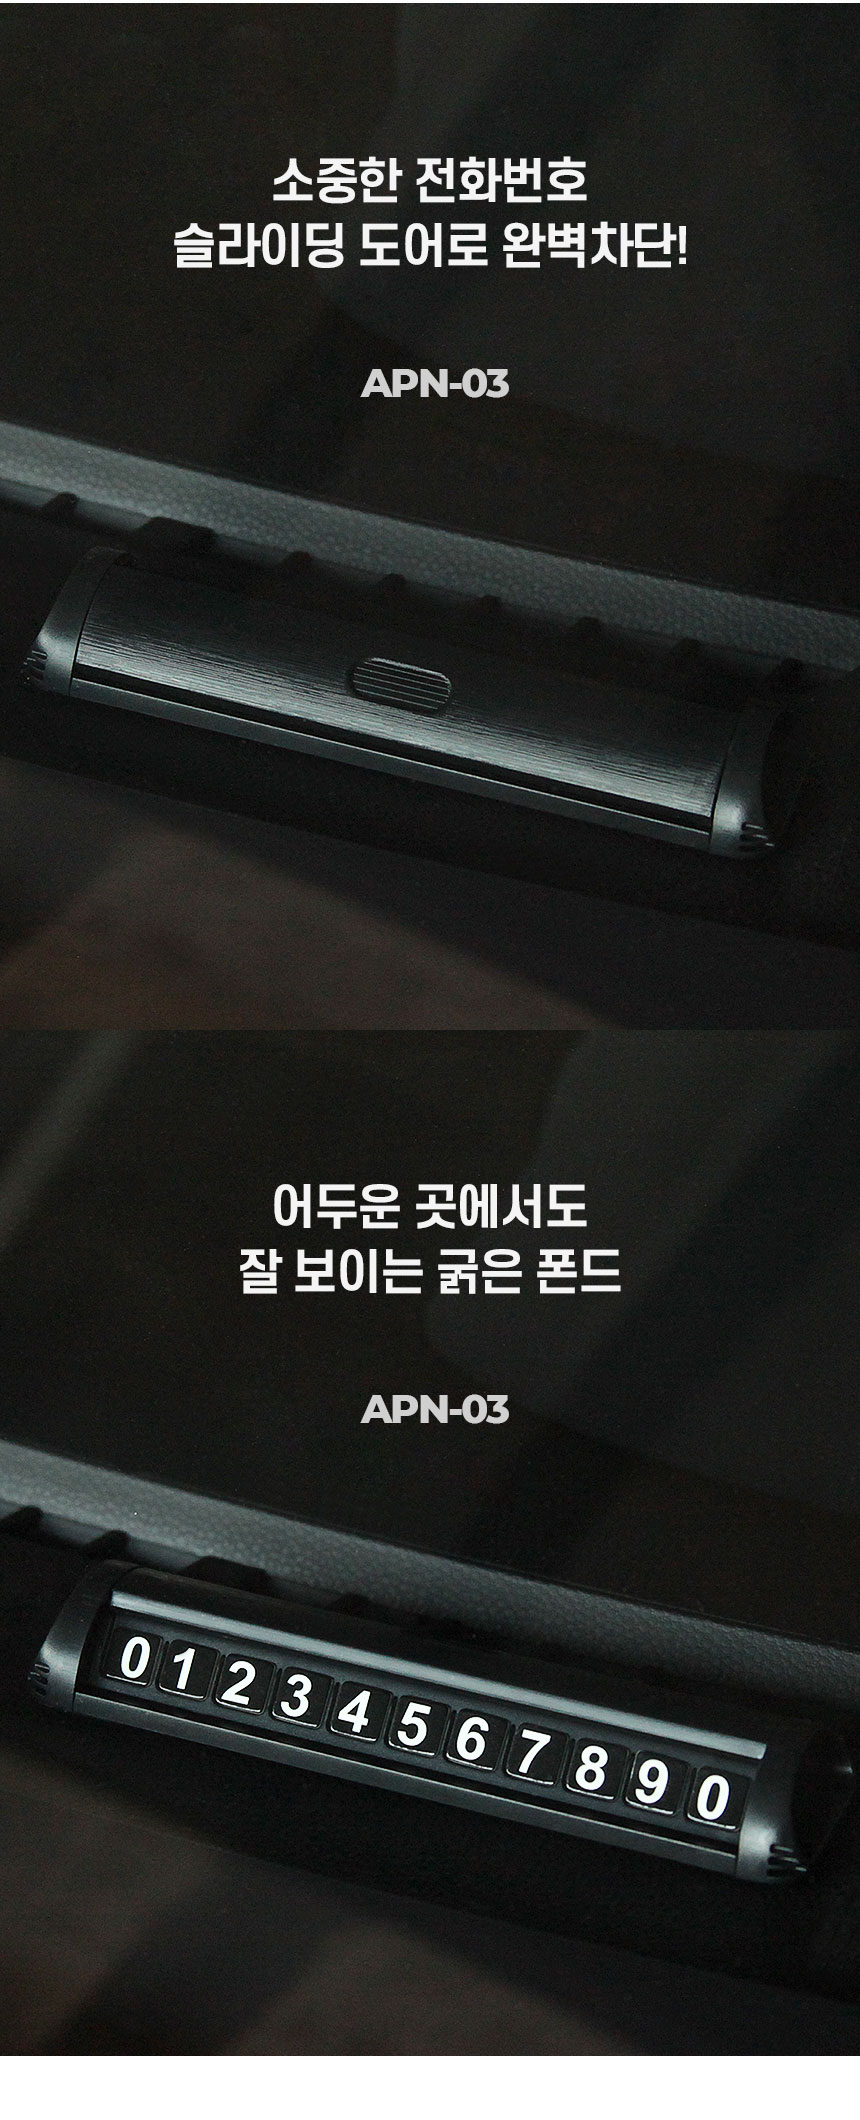 ANYZEN ANYZEN 주차 전화번호 알림판 APN-03